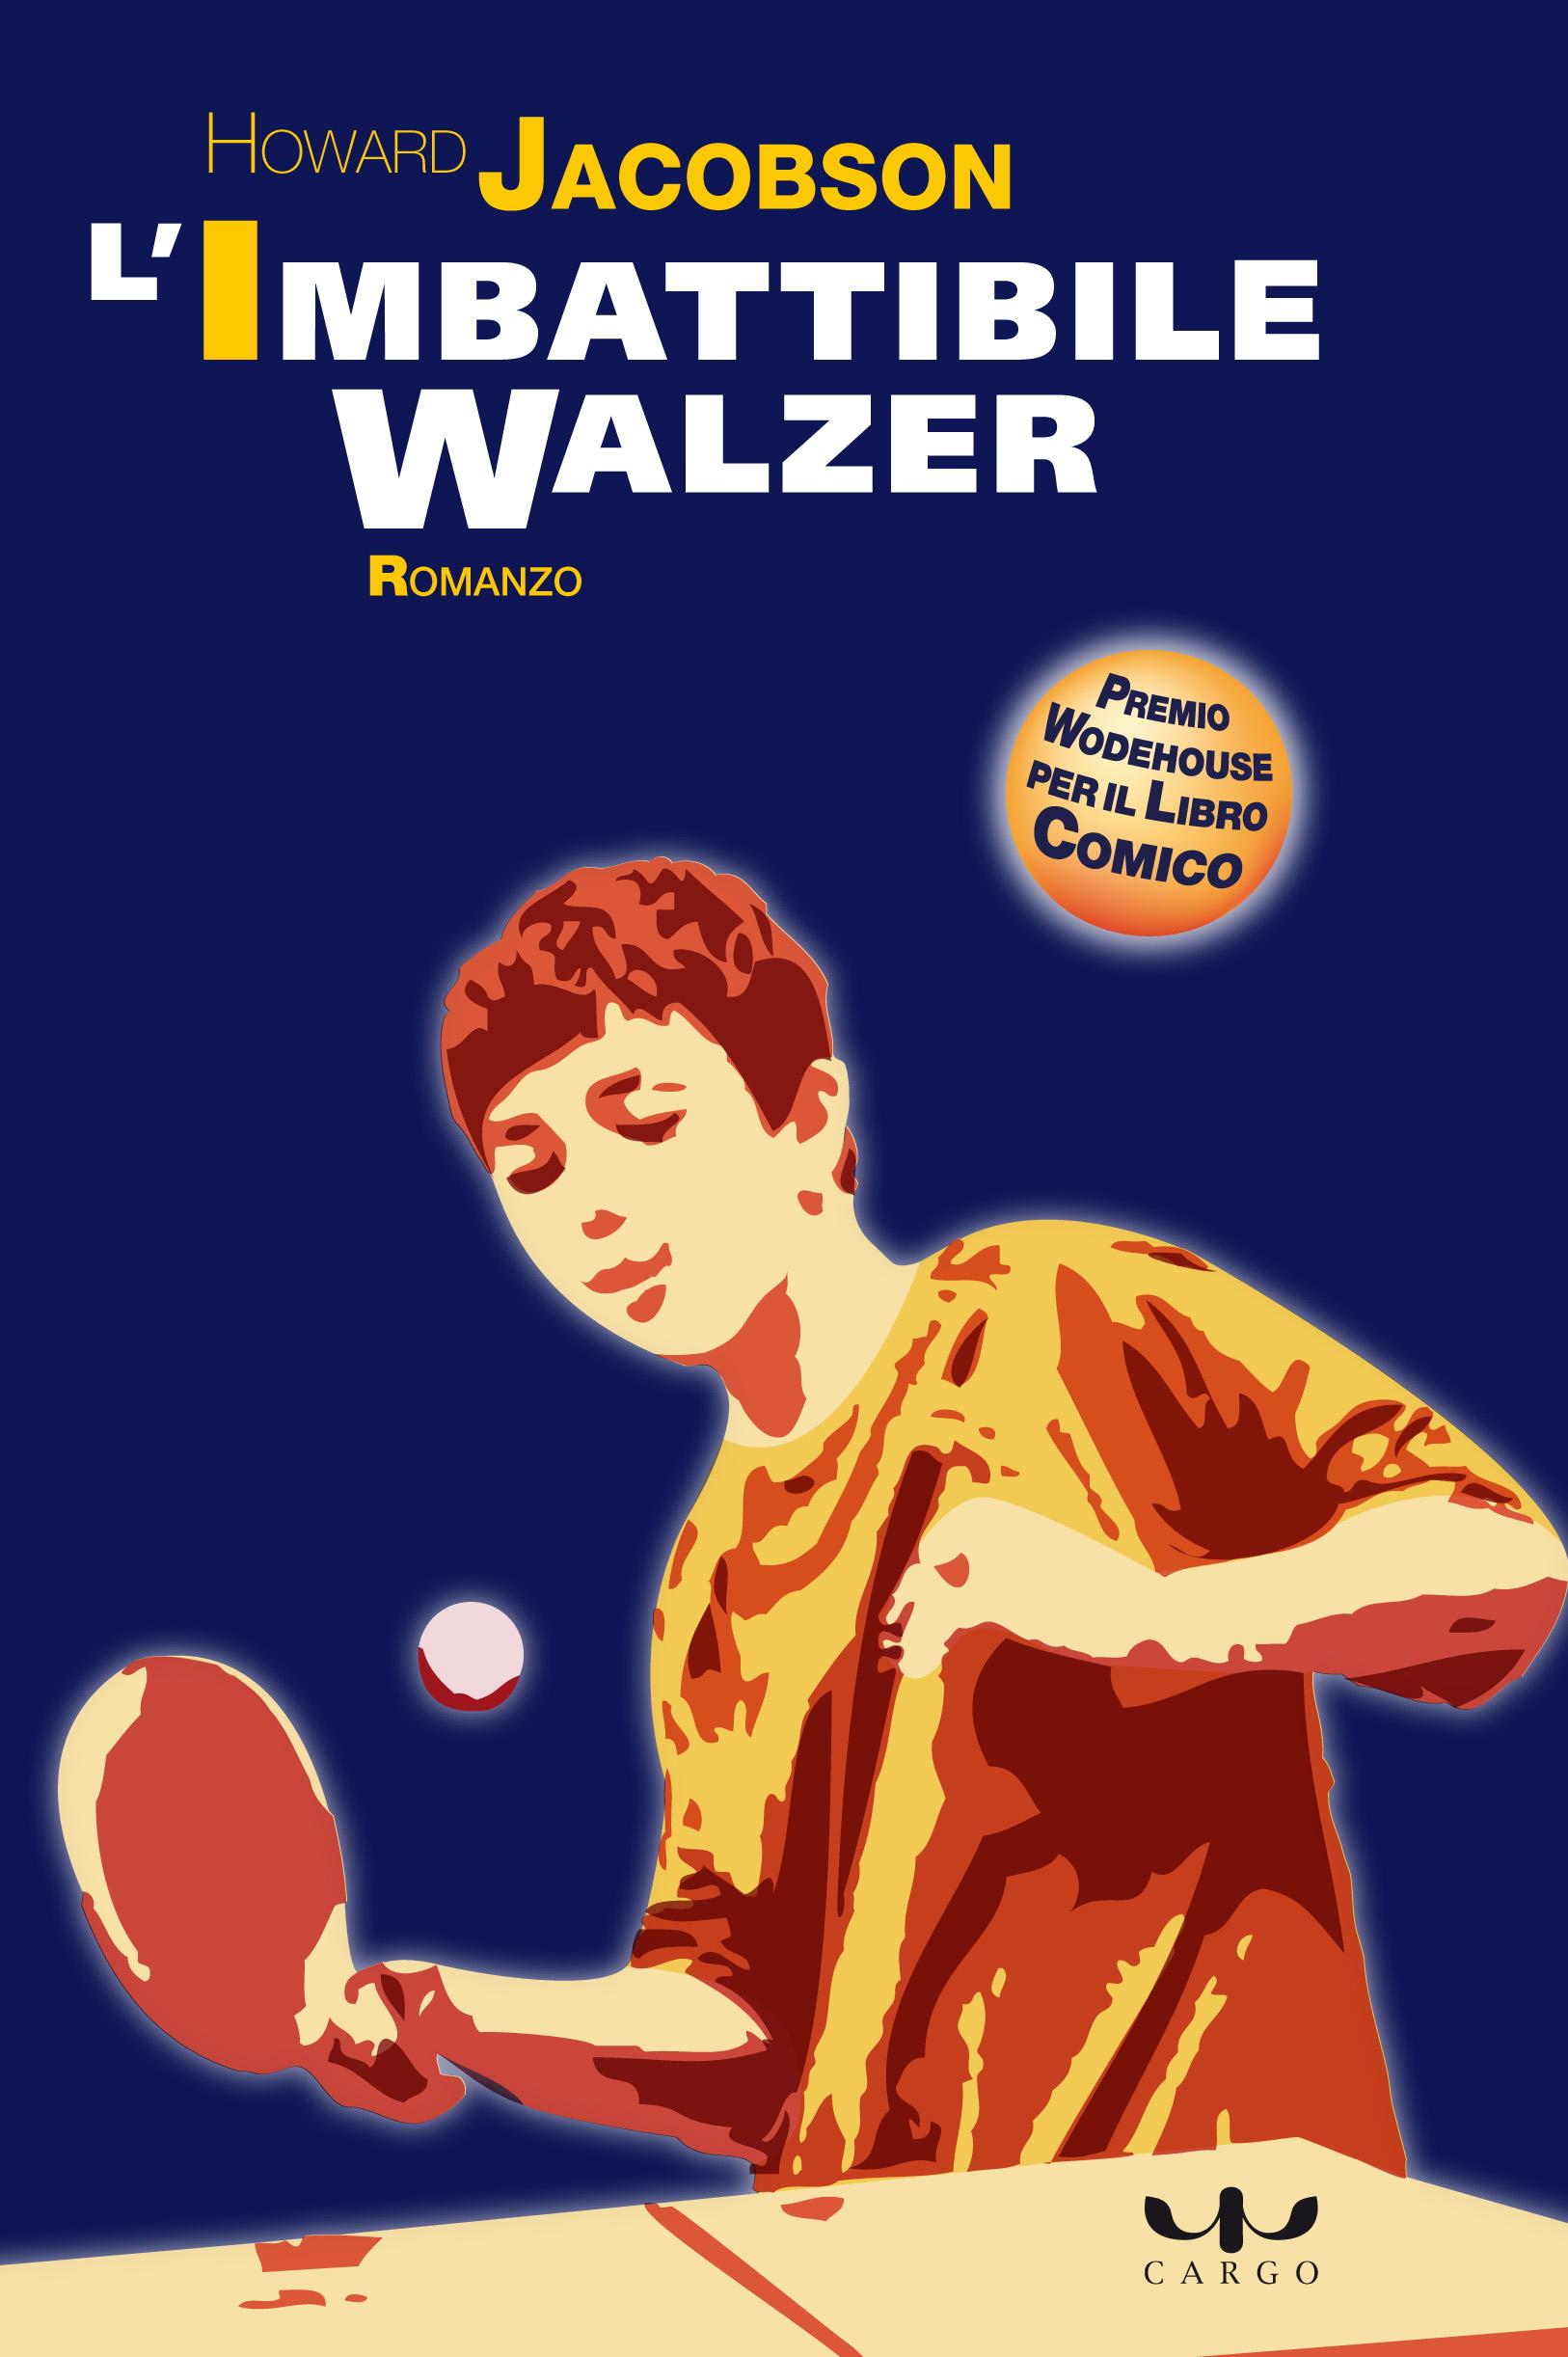 L'imbattibile Walzer